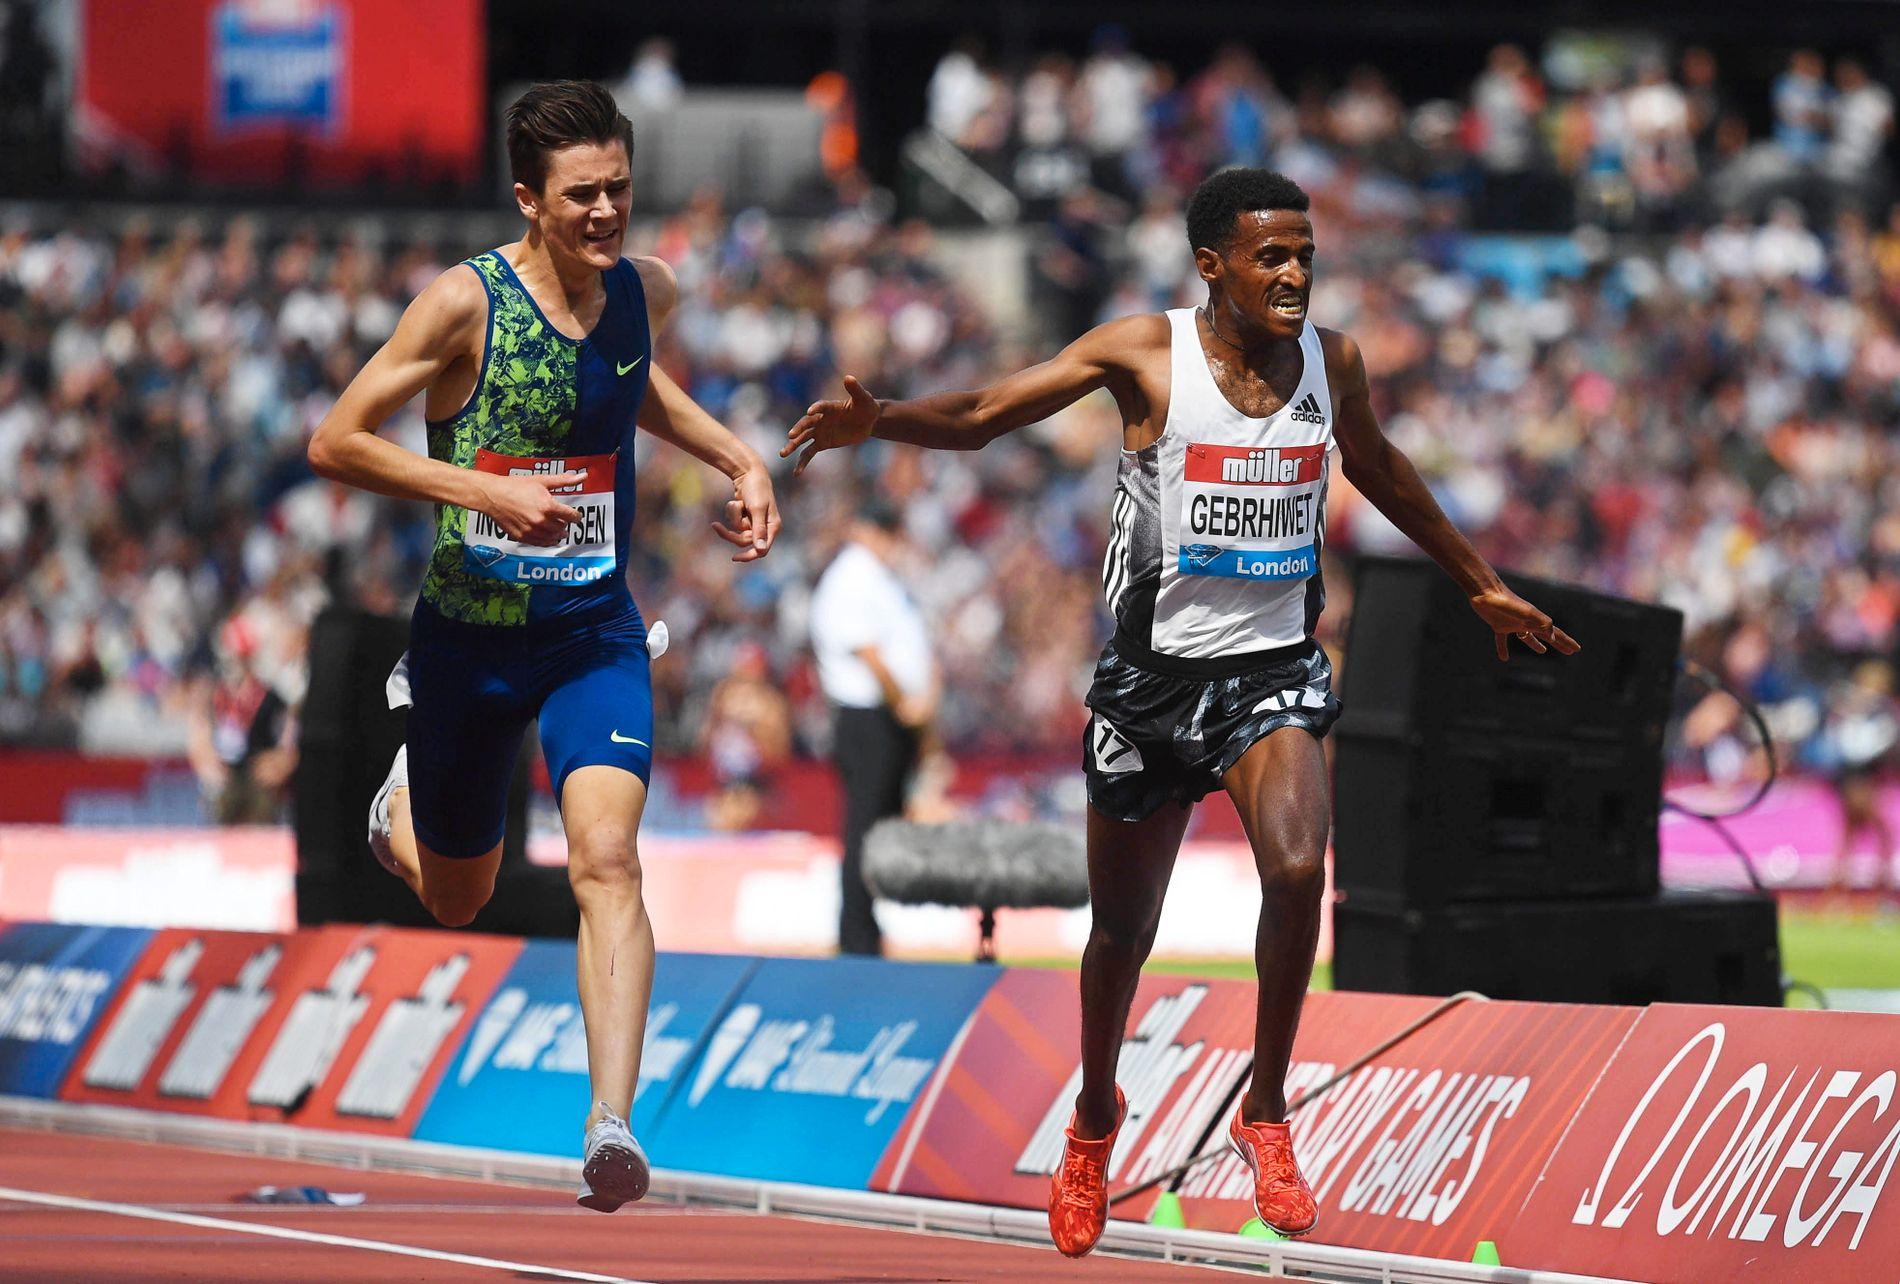 I VERDENSTOPPEN: Jakob Ingebrigtsen i spurtduell mot Hagos Gebrhiwet under 5000-meteren i London for halvannen uke siden.